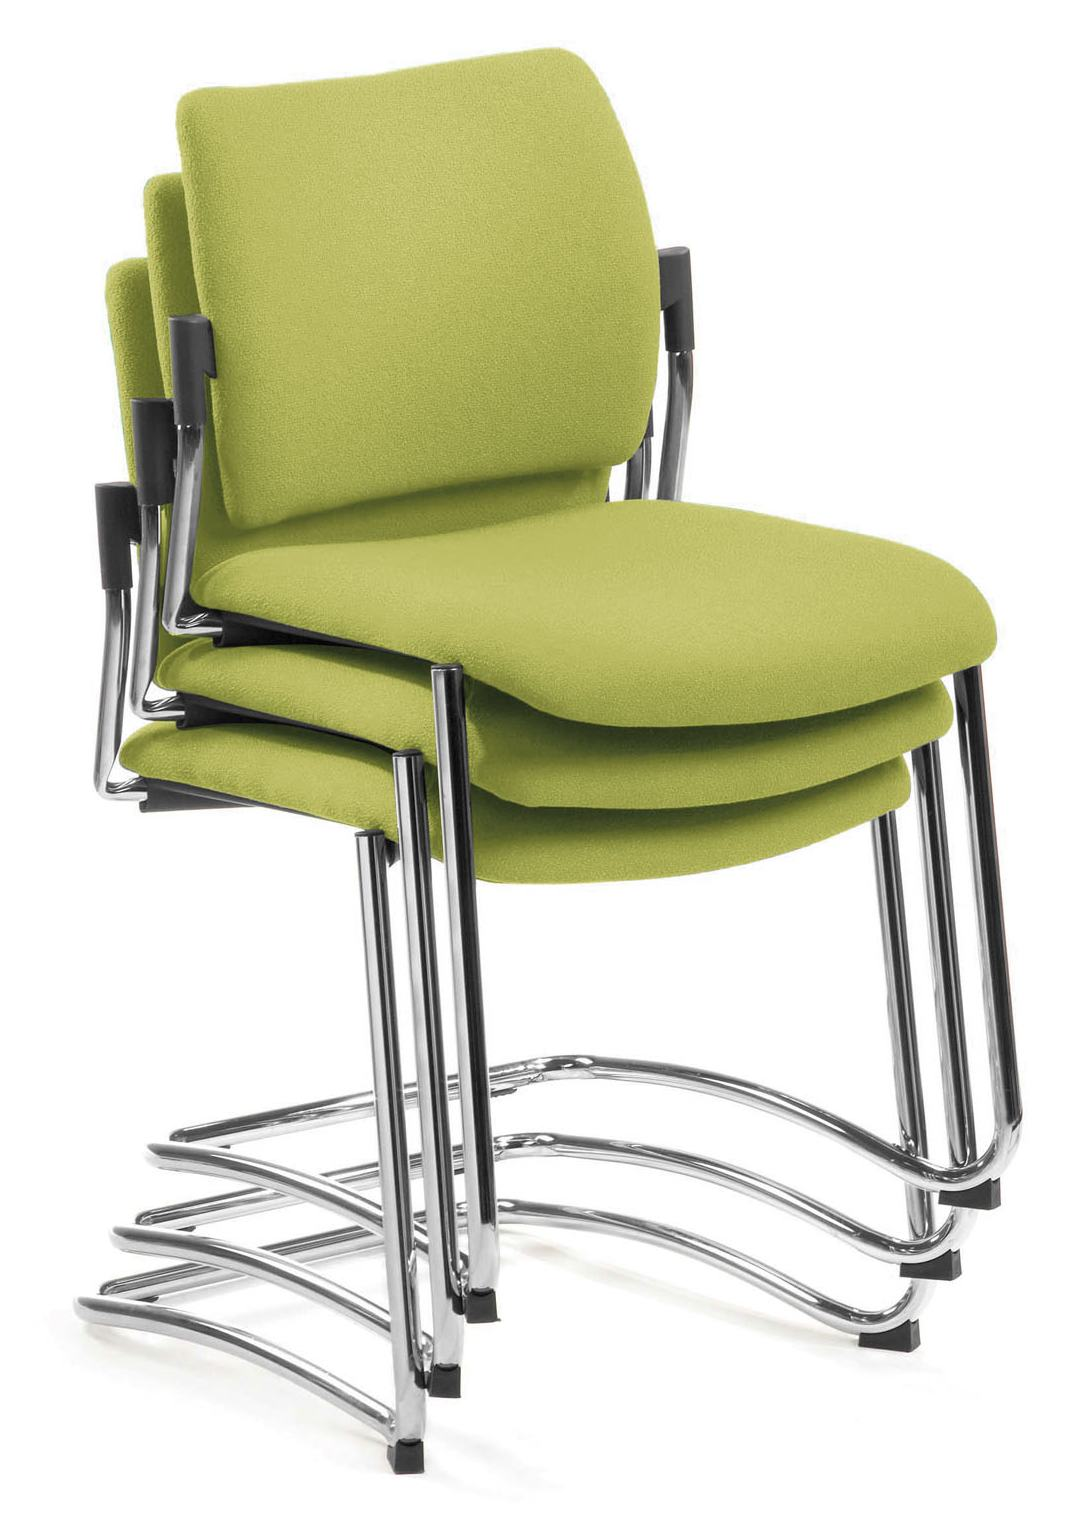 Besprechungsstuhl choice s gestapelt stabiles for Design stuhl freischwinger piet 30